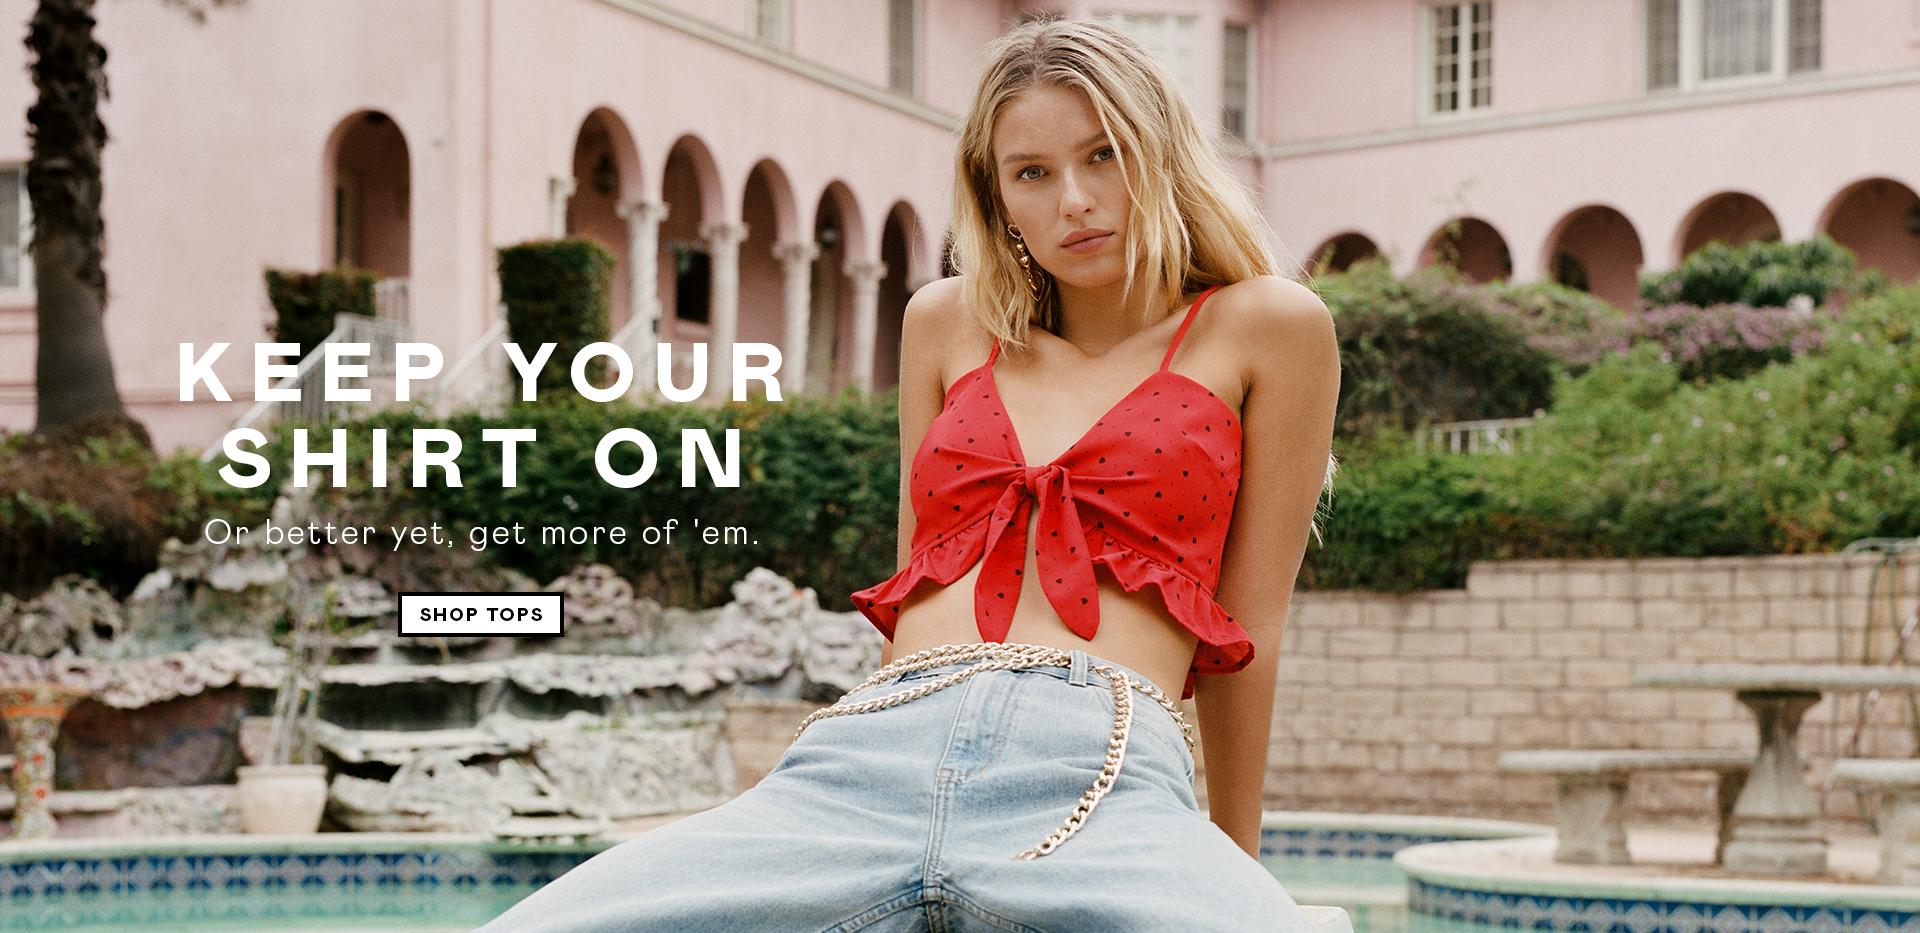 08a9ea1c2fe Women's Online Clothes & Fashion Shopping   Nasty Gal